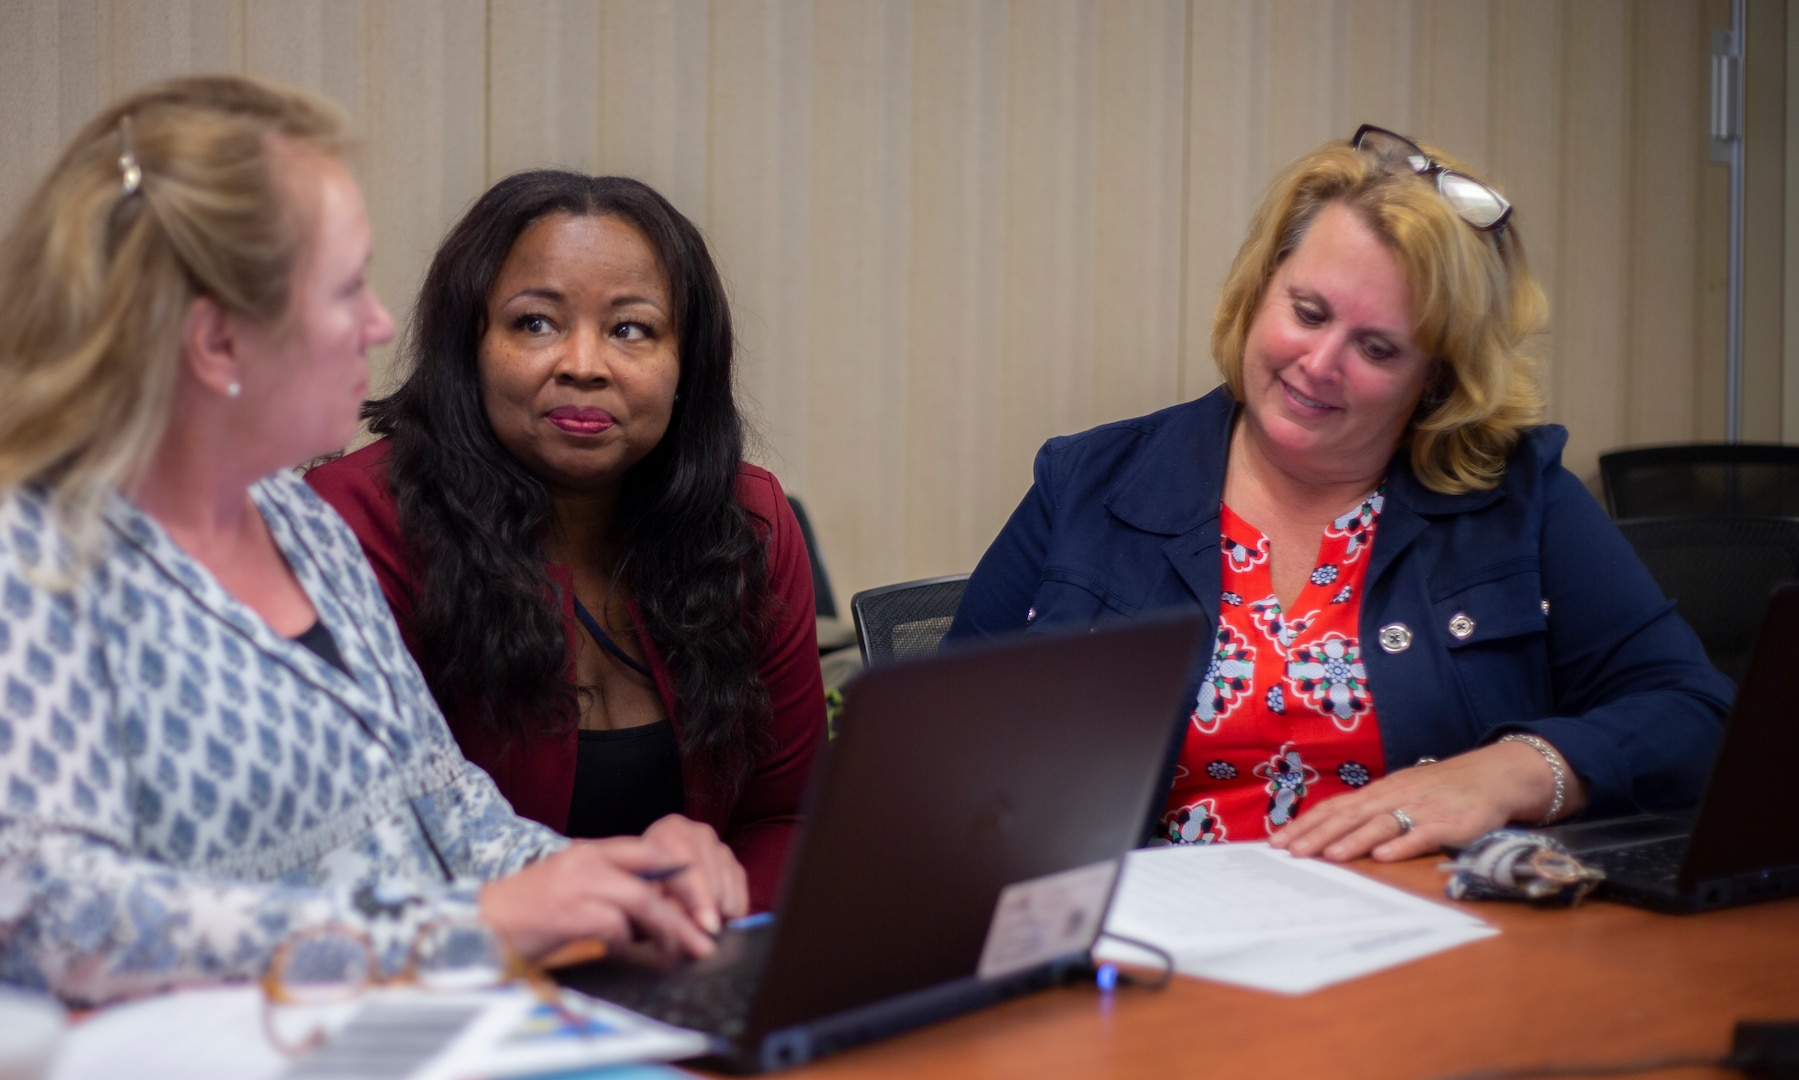 Three women discuss work items.